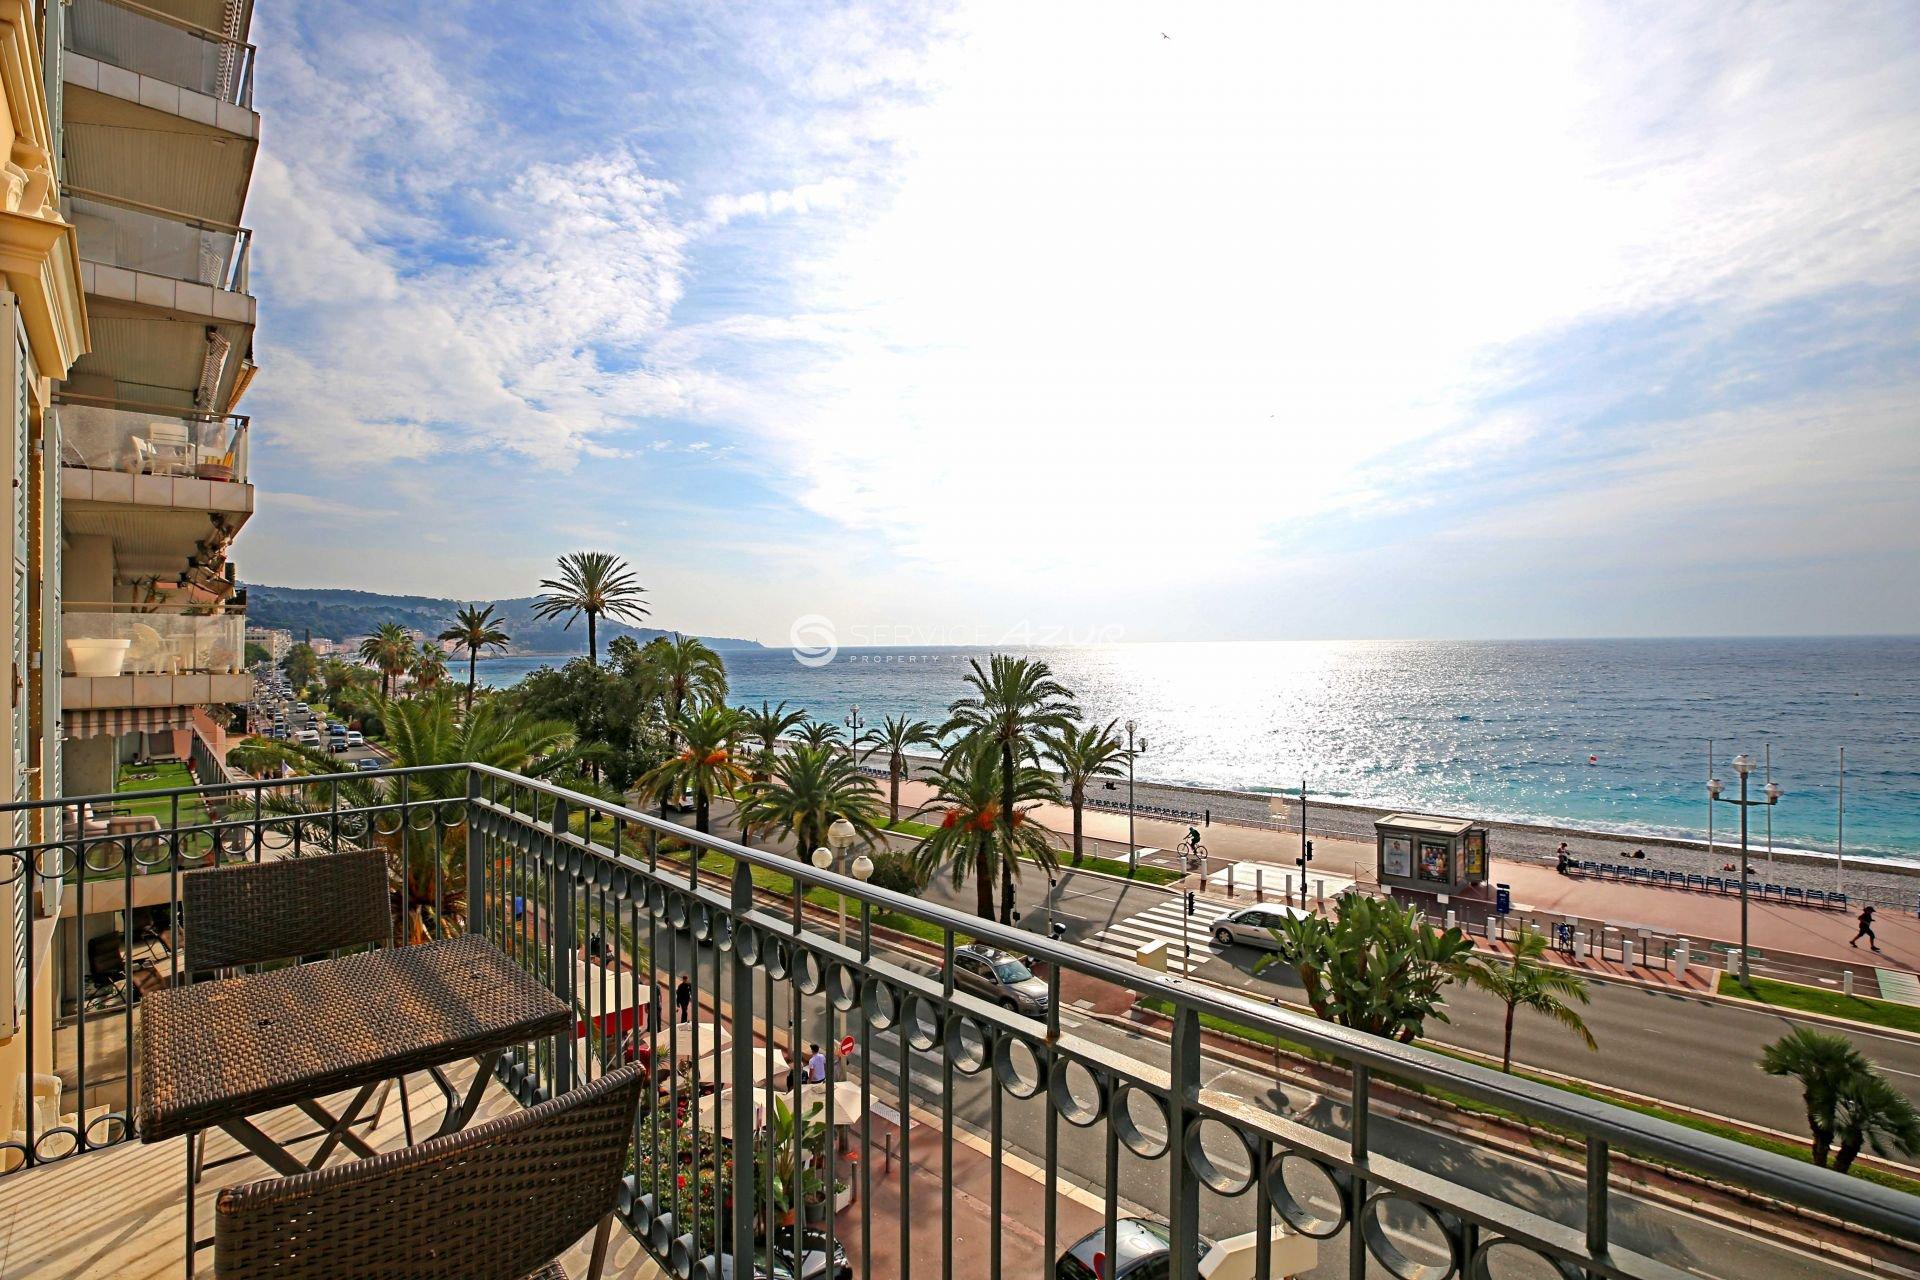 Nice - Promenade des Anglais - Situation exceptionnelle